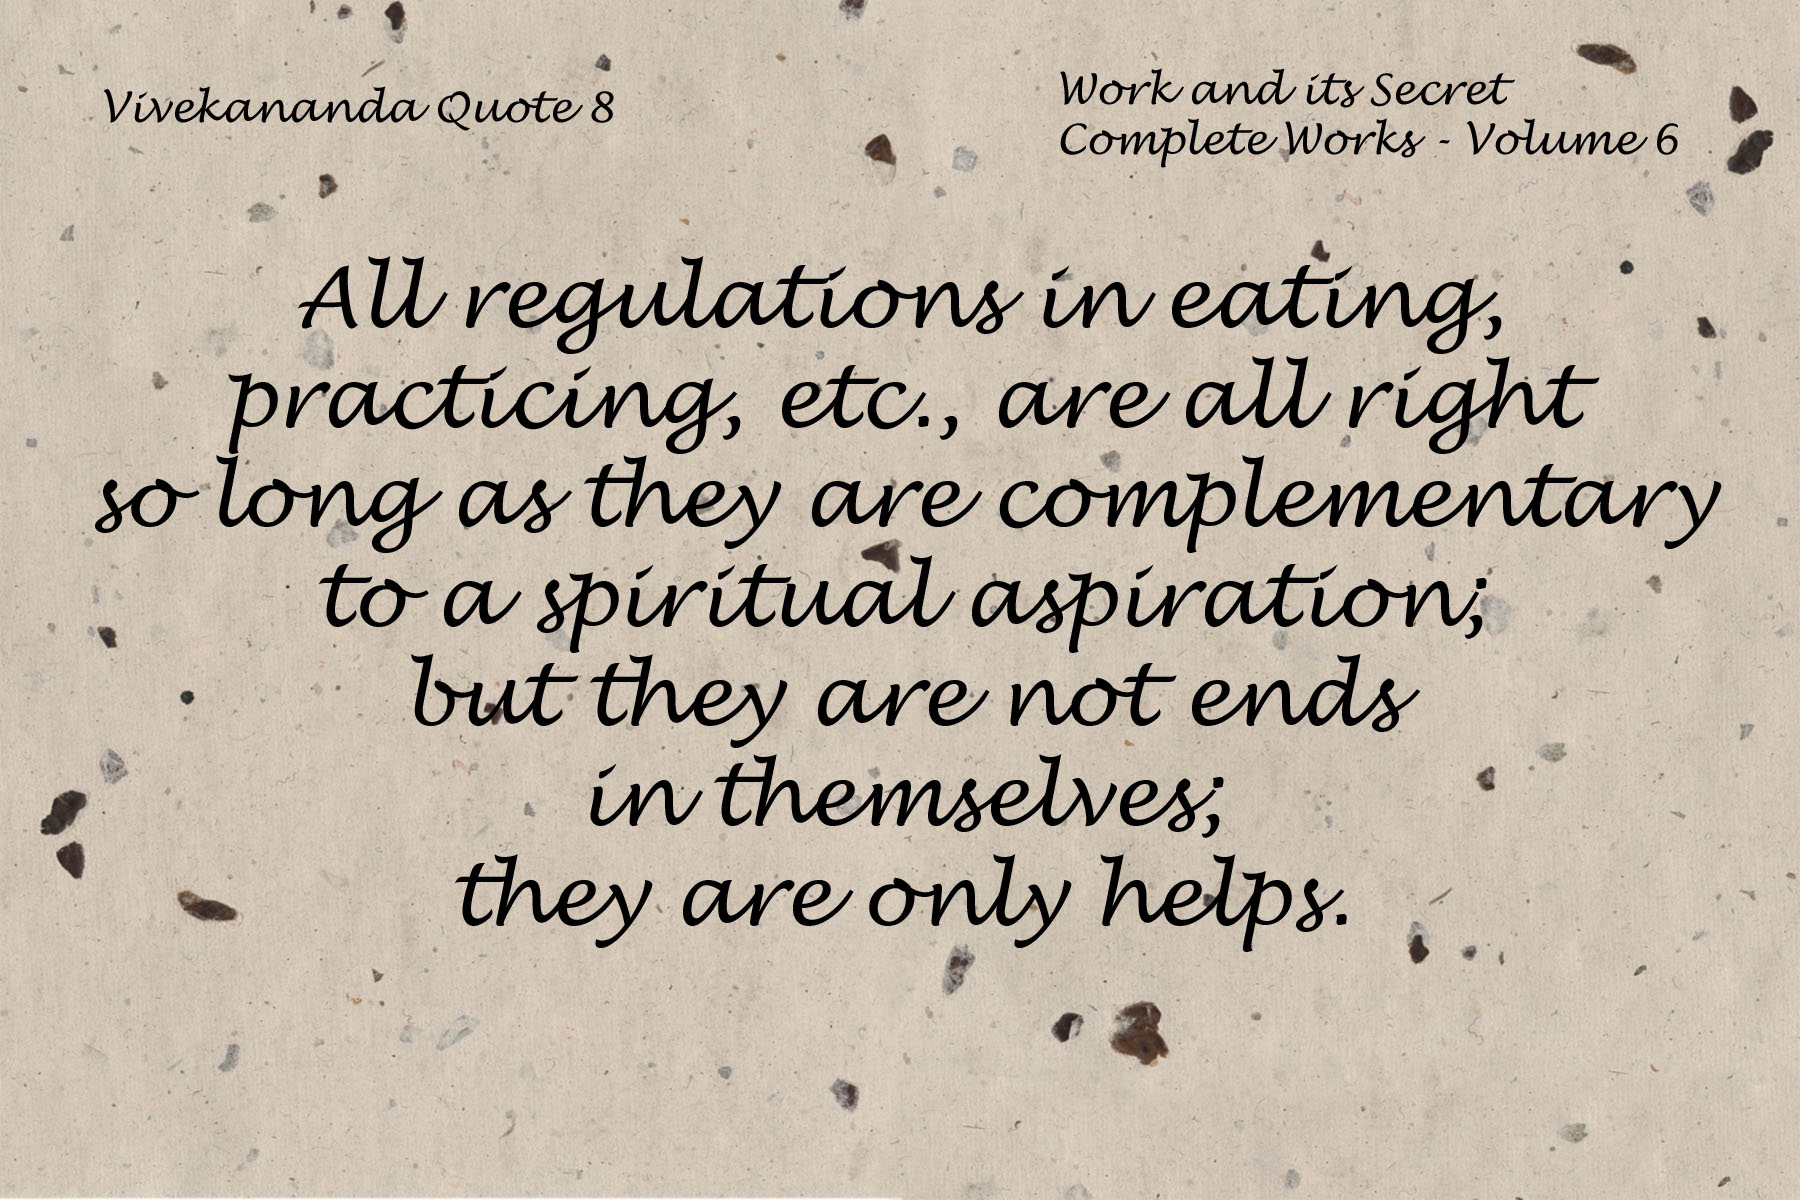 Vivekananda Quote 8